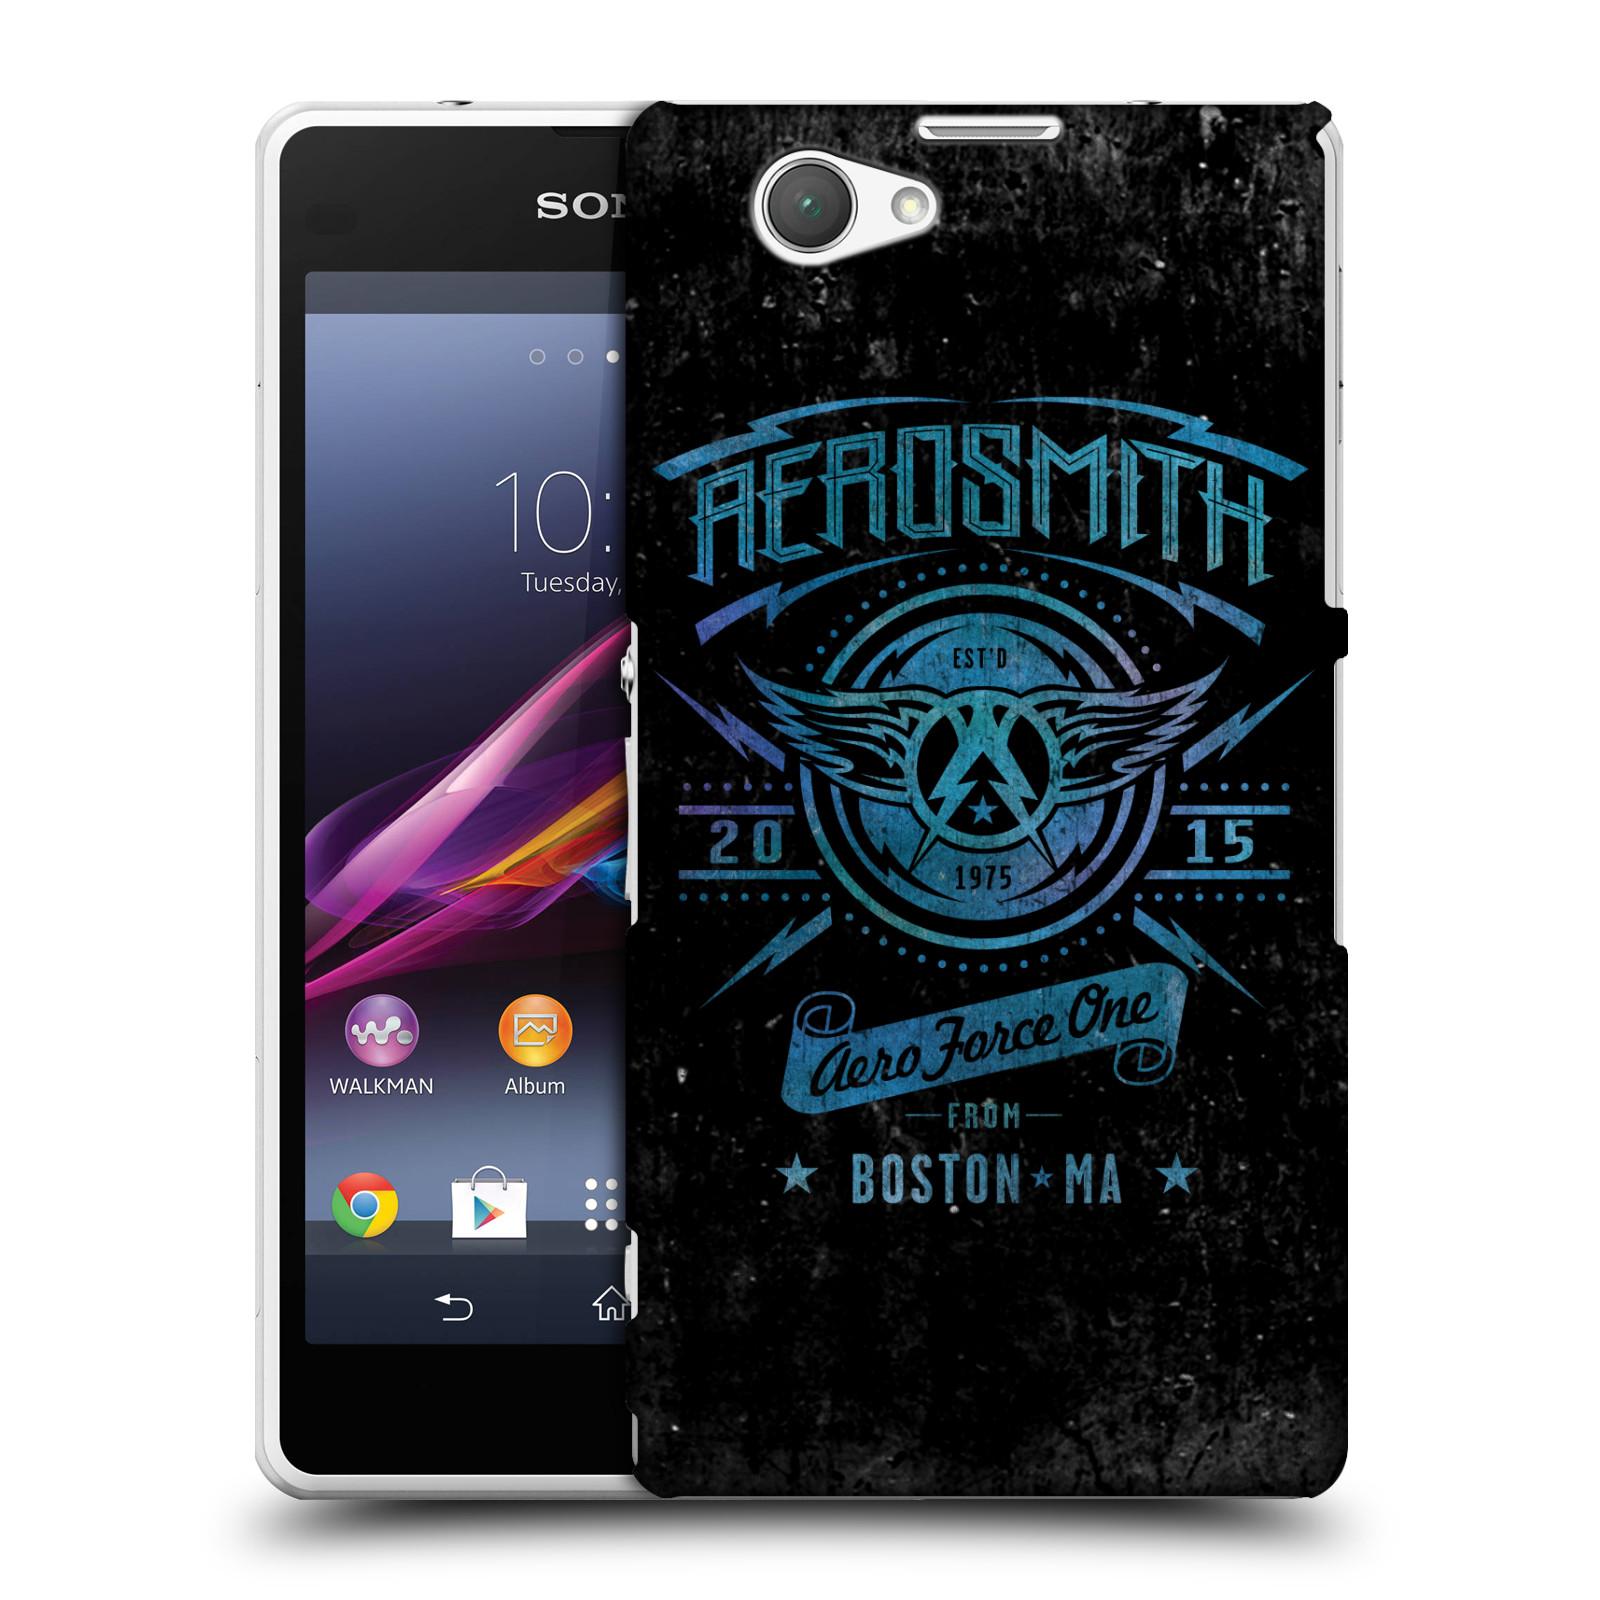 Plastové pouzdro na mobil Sony Xperia Z1 Compact D5503 HEAD CASE - Aerosmith - Aero Force One